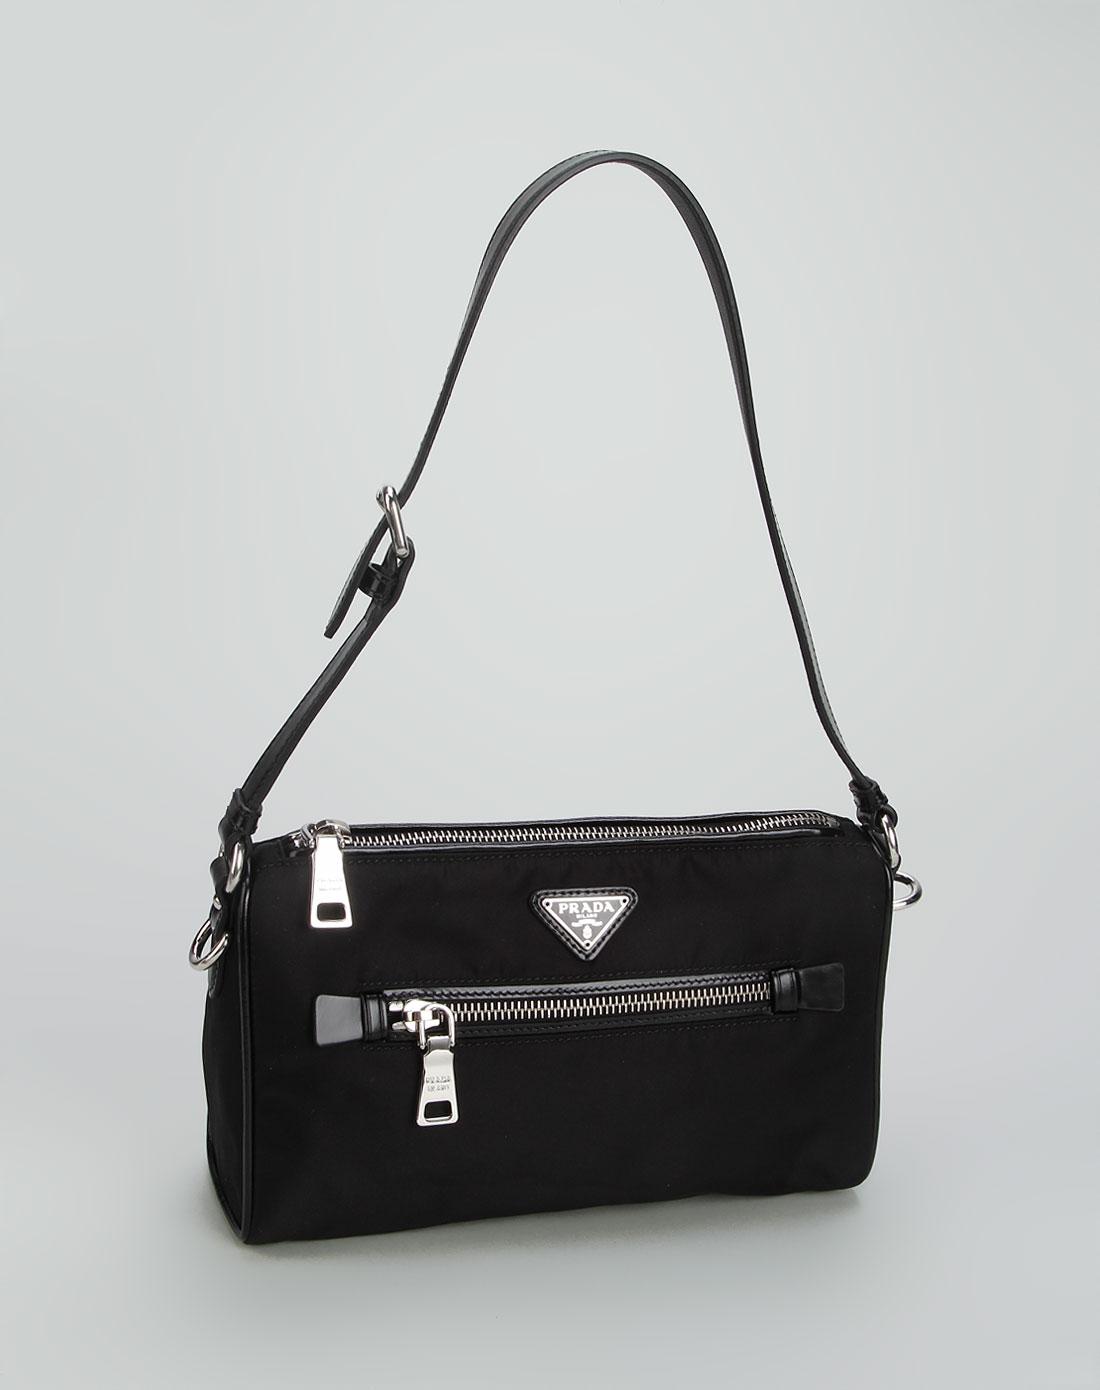 prada女款黑色简约休闲手提包